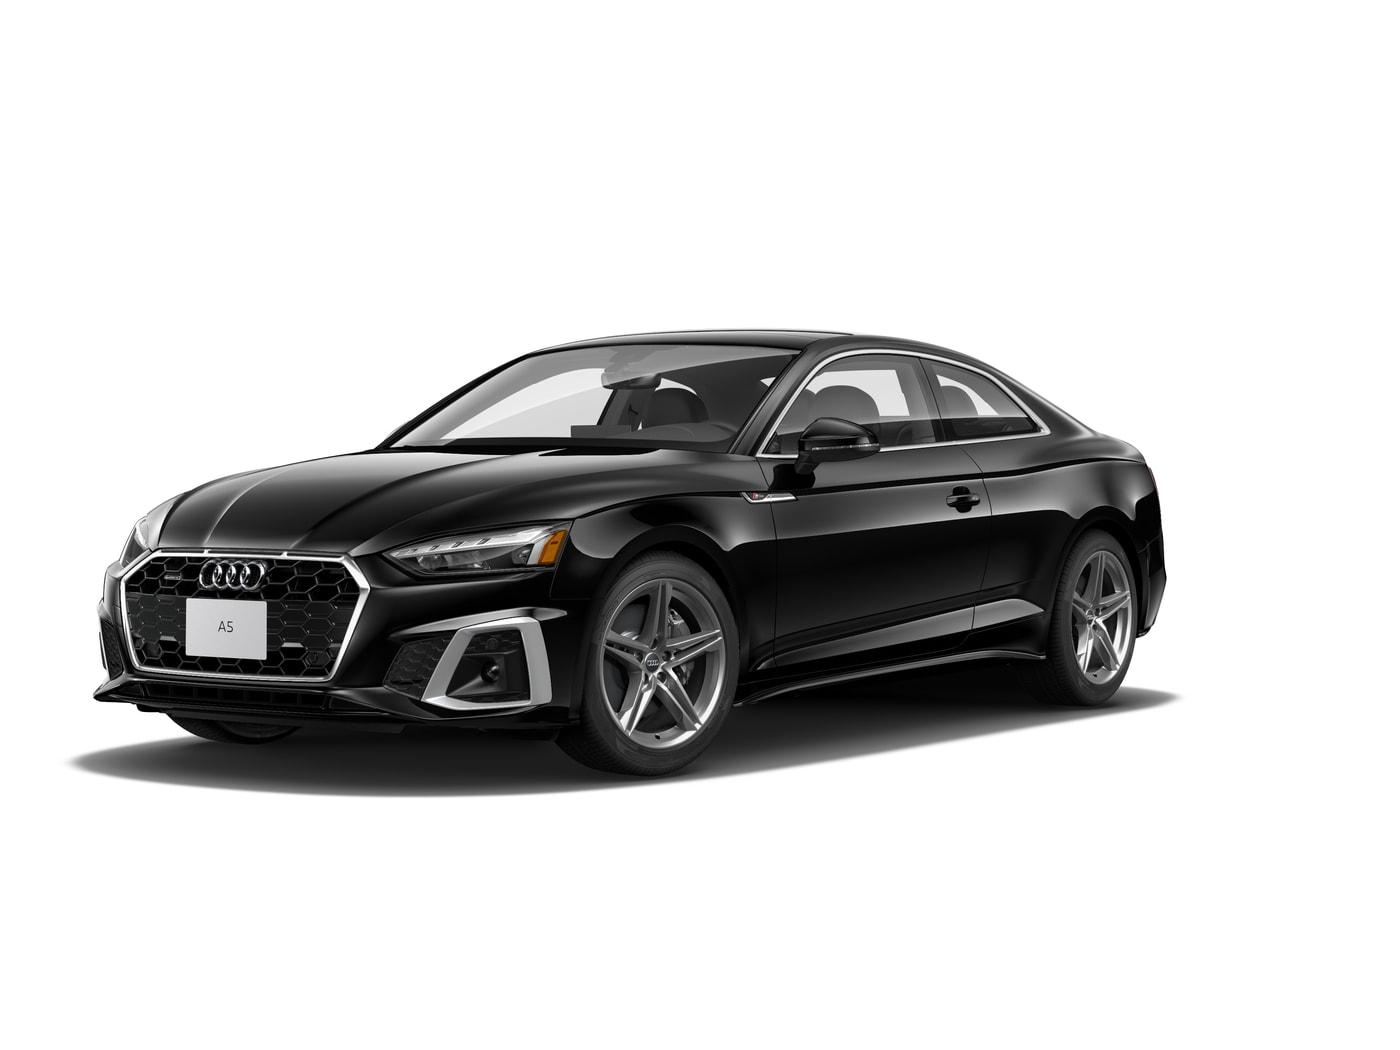 Specials 2020 Audi A5 2.0T Premium Plus Coupe for sale in Rutland, Vt